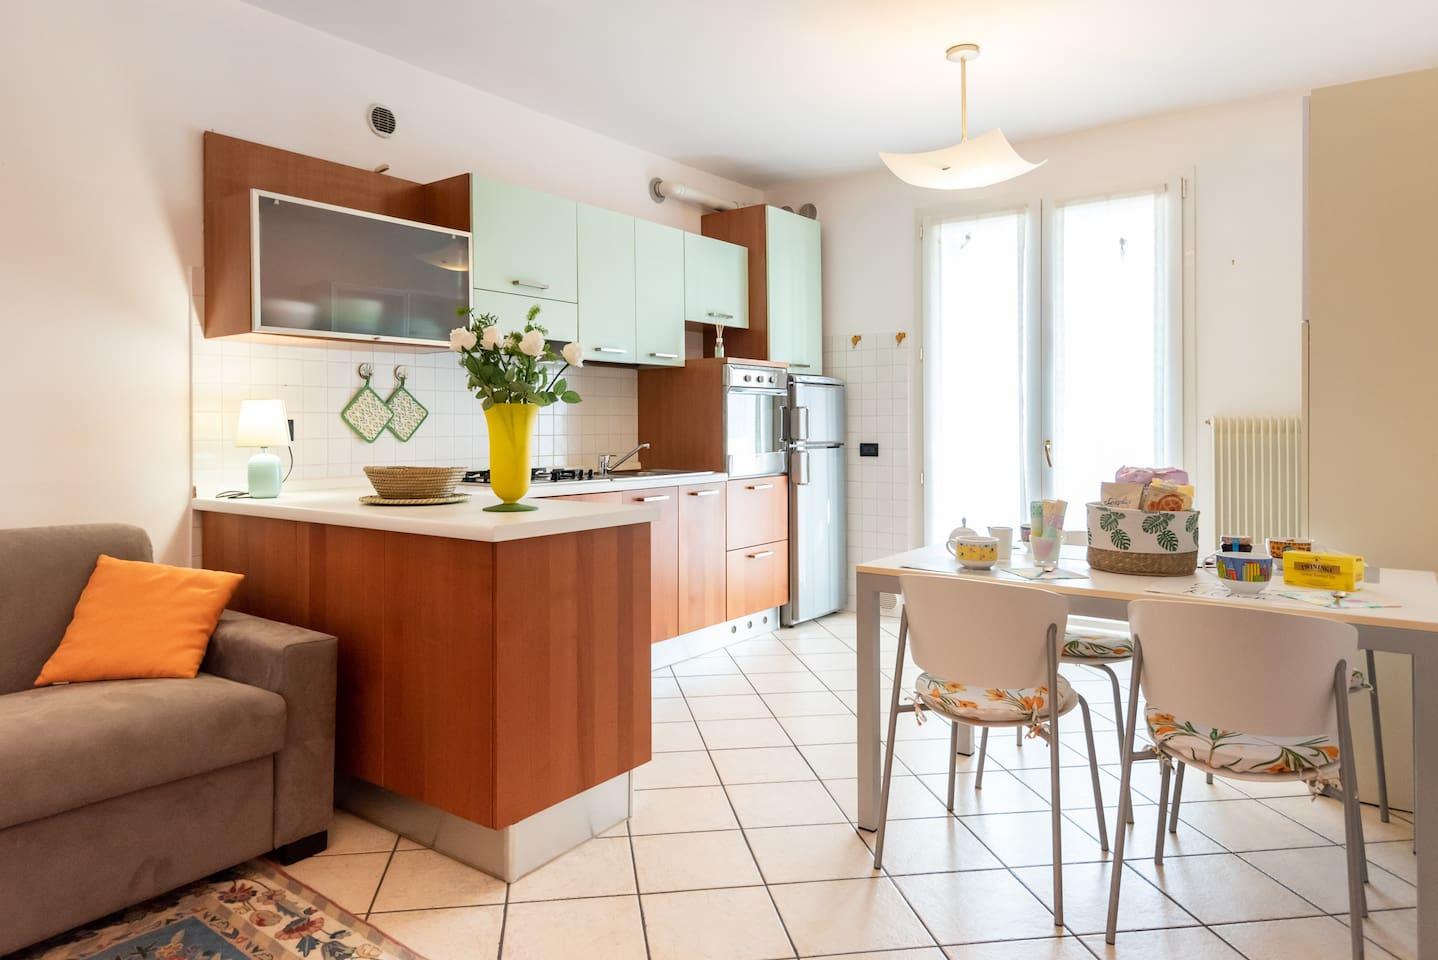 Casa Raffaello - Living room and kitchen